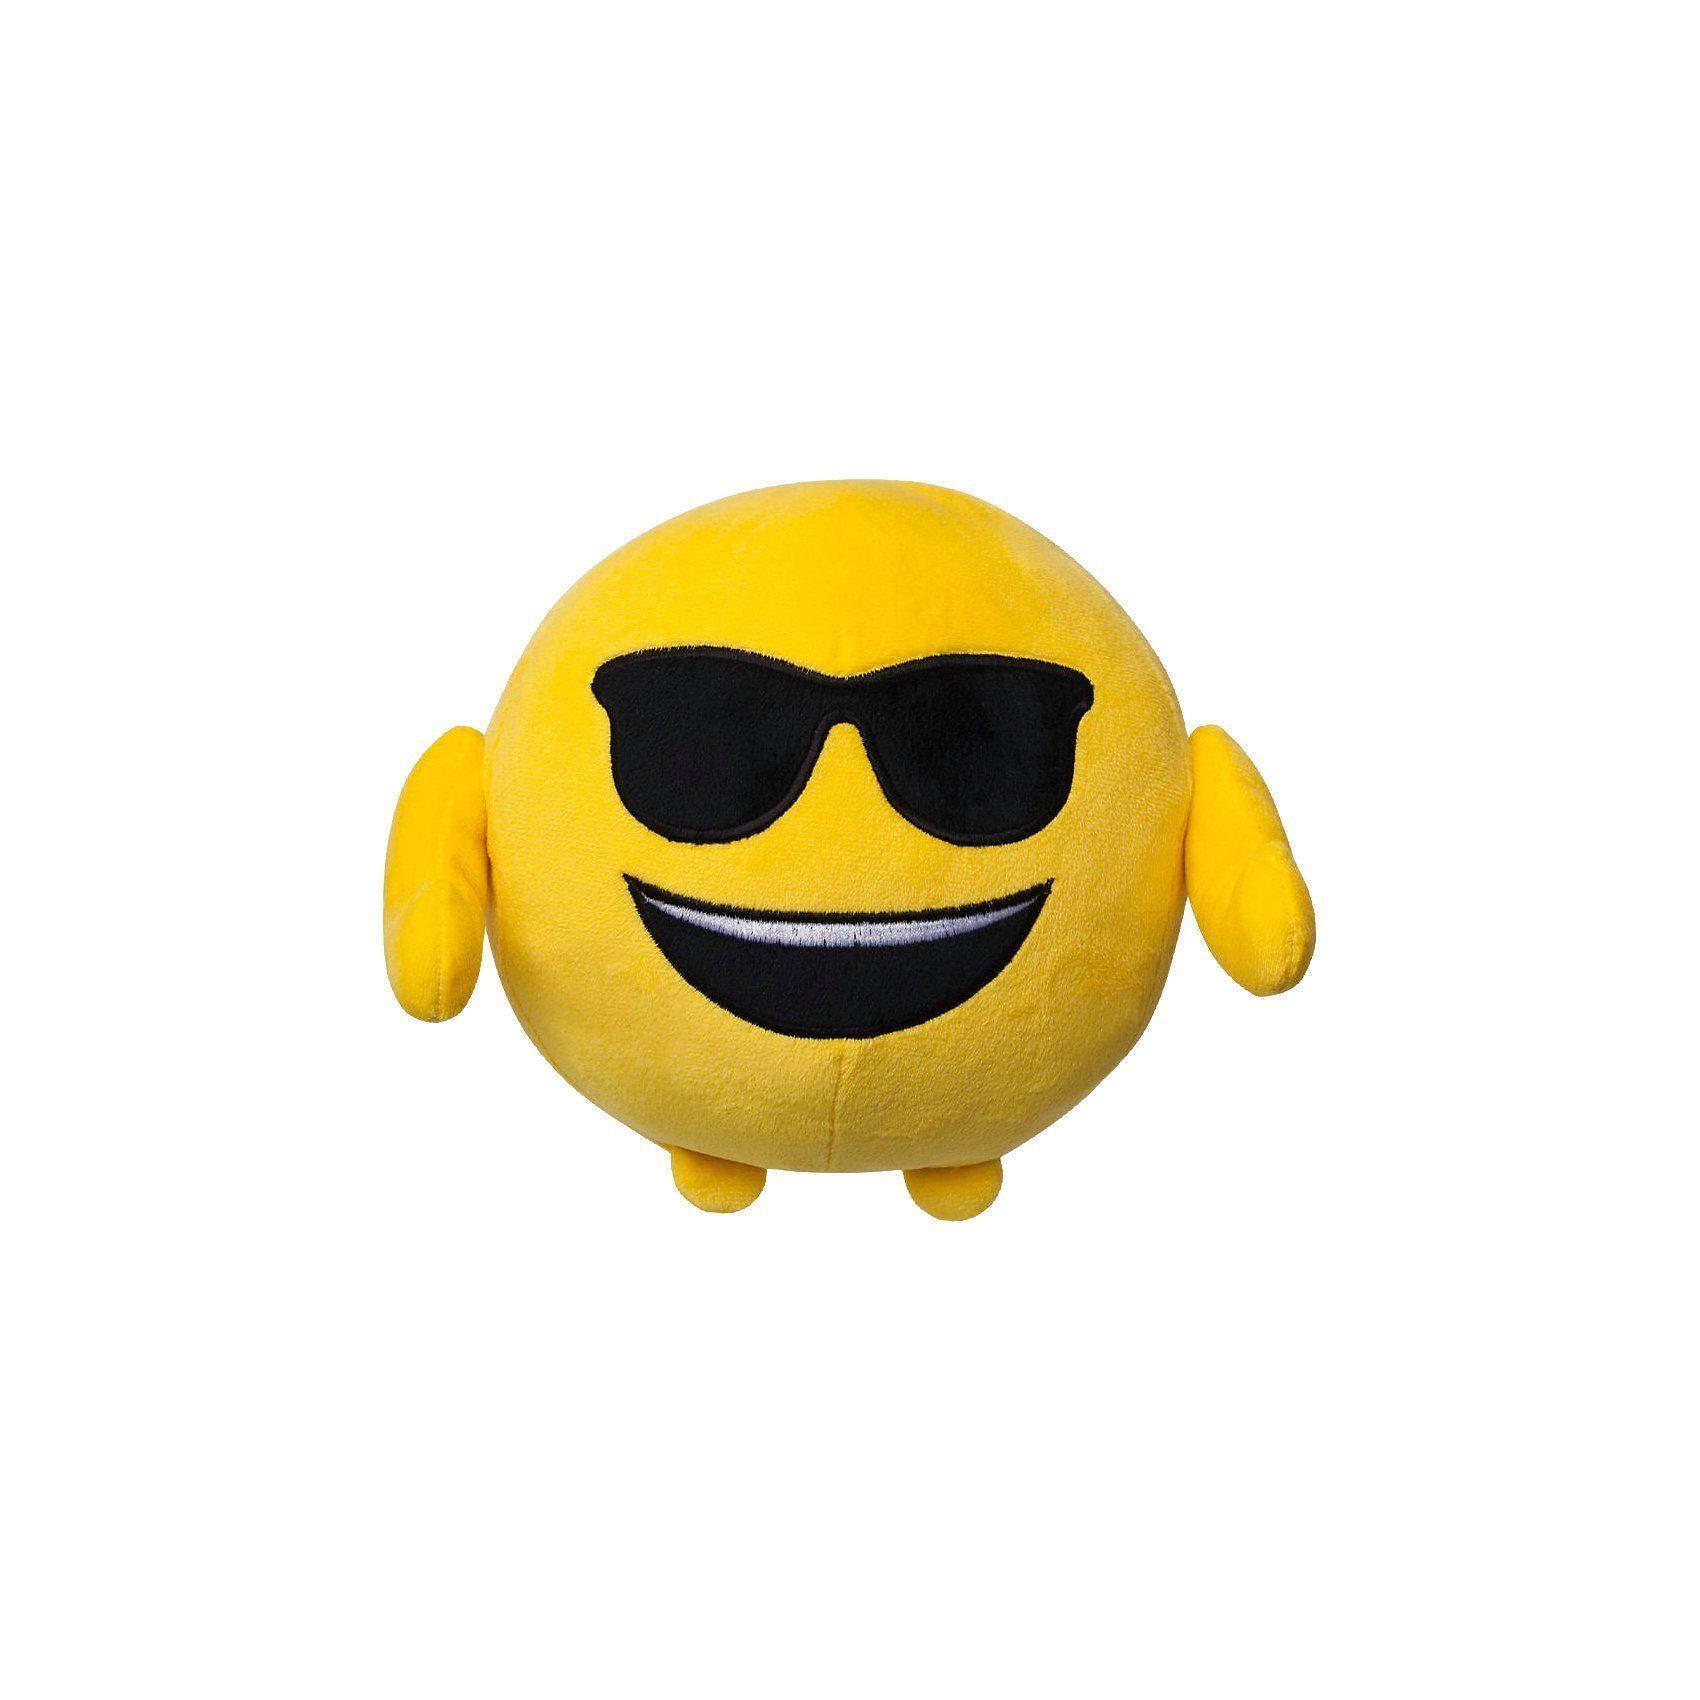 BOTI Imoji Plüschfigur in Ballform Cool, 18cm